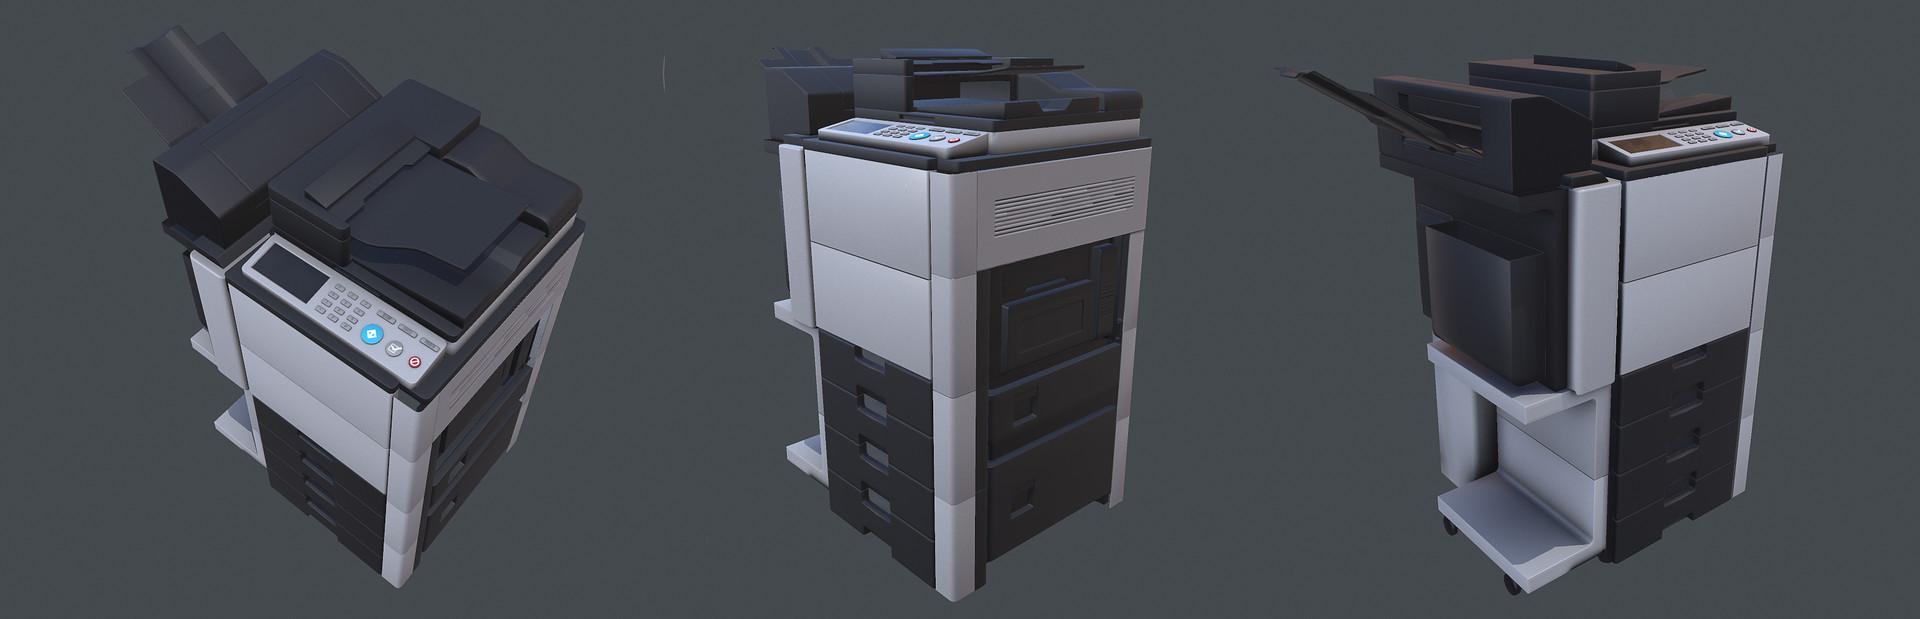 Sergey tabakov photocopier machine 14